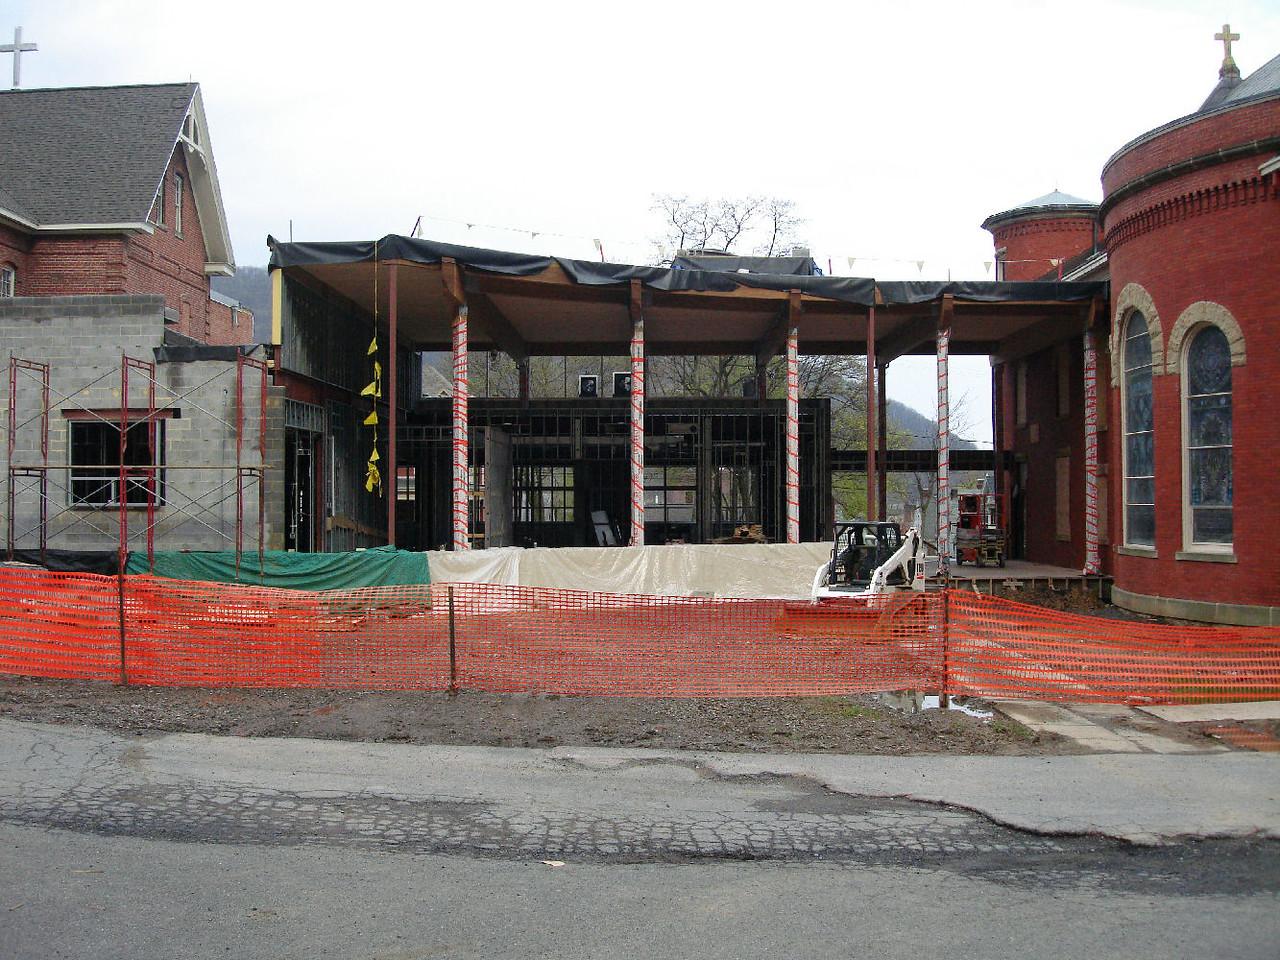 Saint Matthews Renovations 4-28-07 3